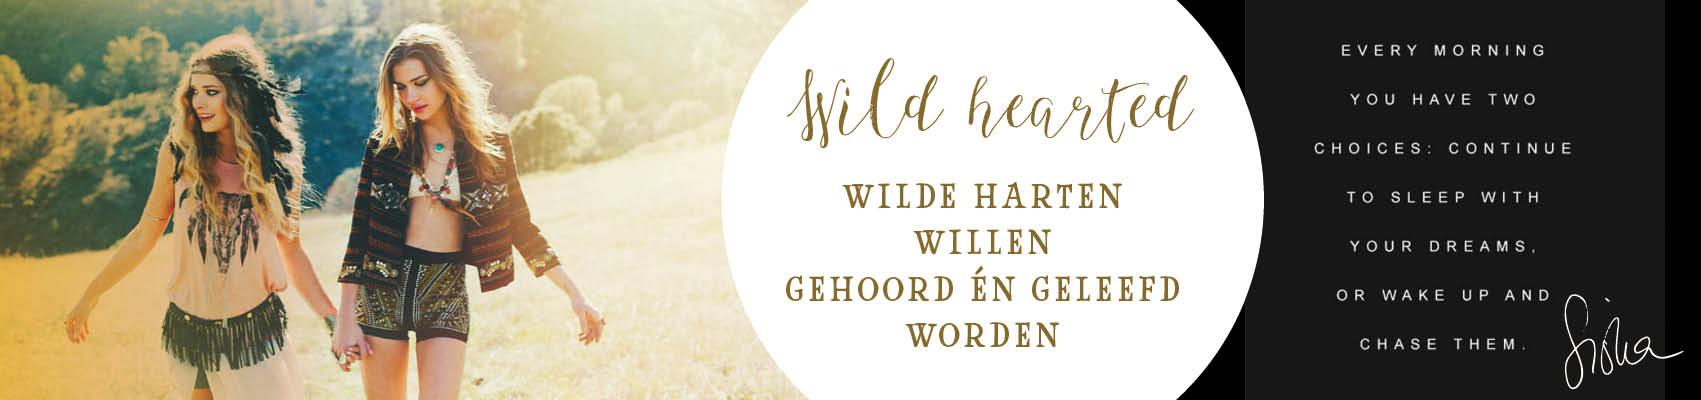 17_WILDE HART-slider2-wildhearted